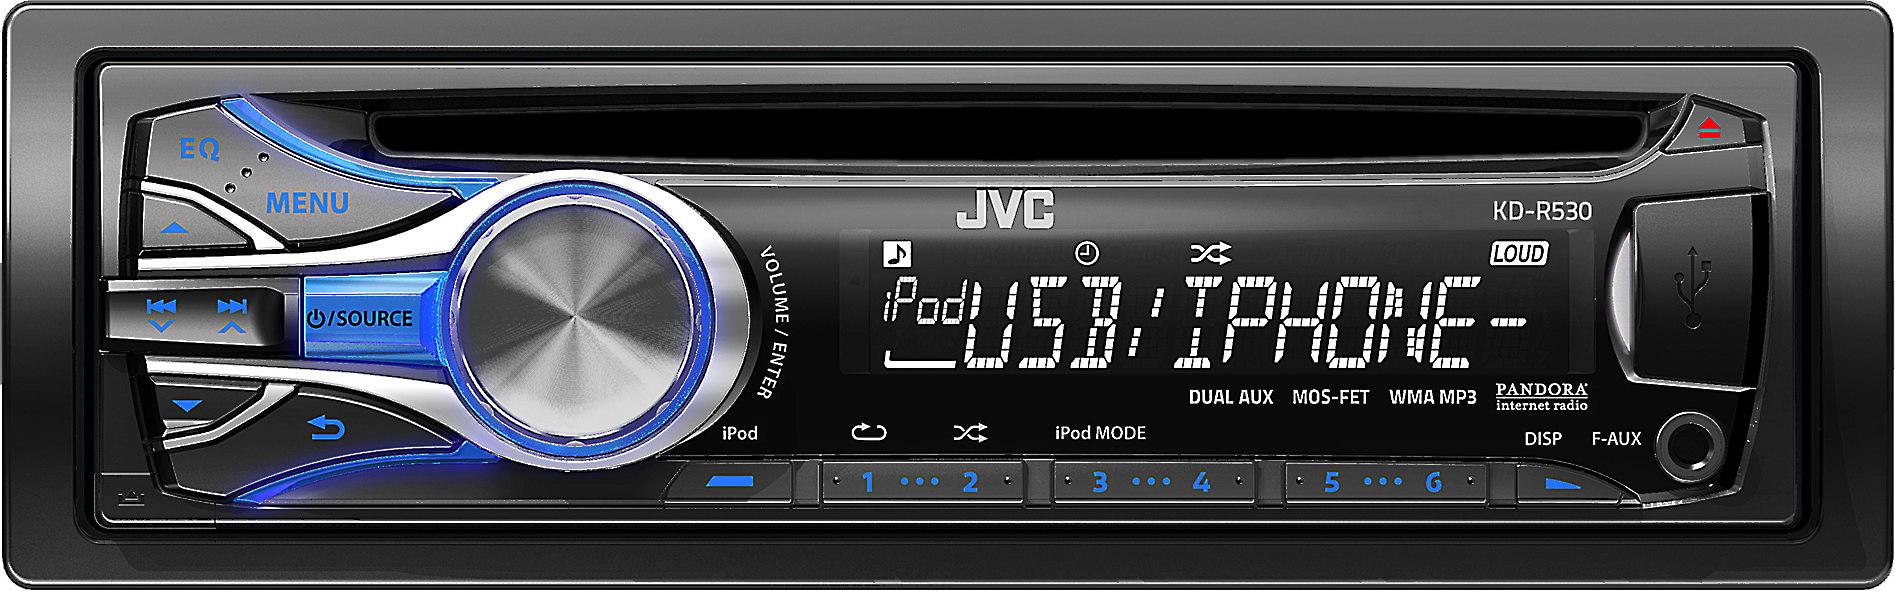 [SCHEMATICS_4LK]  WN_8125] Jvc Kd R200 Wiring Harness Wiring Diagram | Jvc Kd R200 Wire Diagram |  | Elinu Numap Mohammedshrine Librar Wiring 101